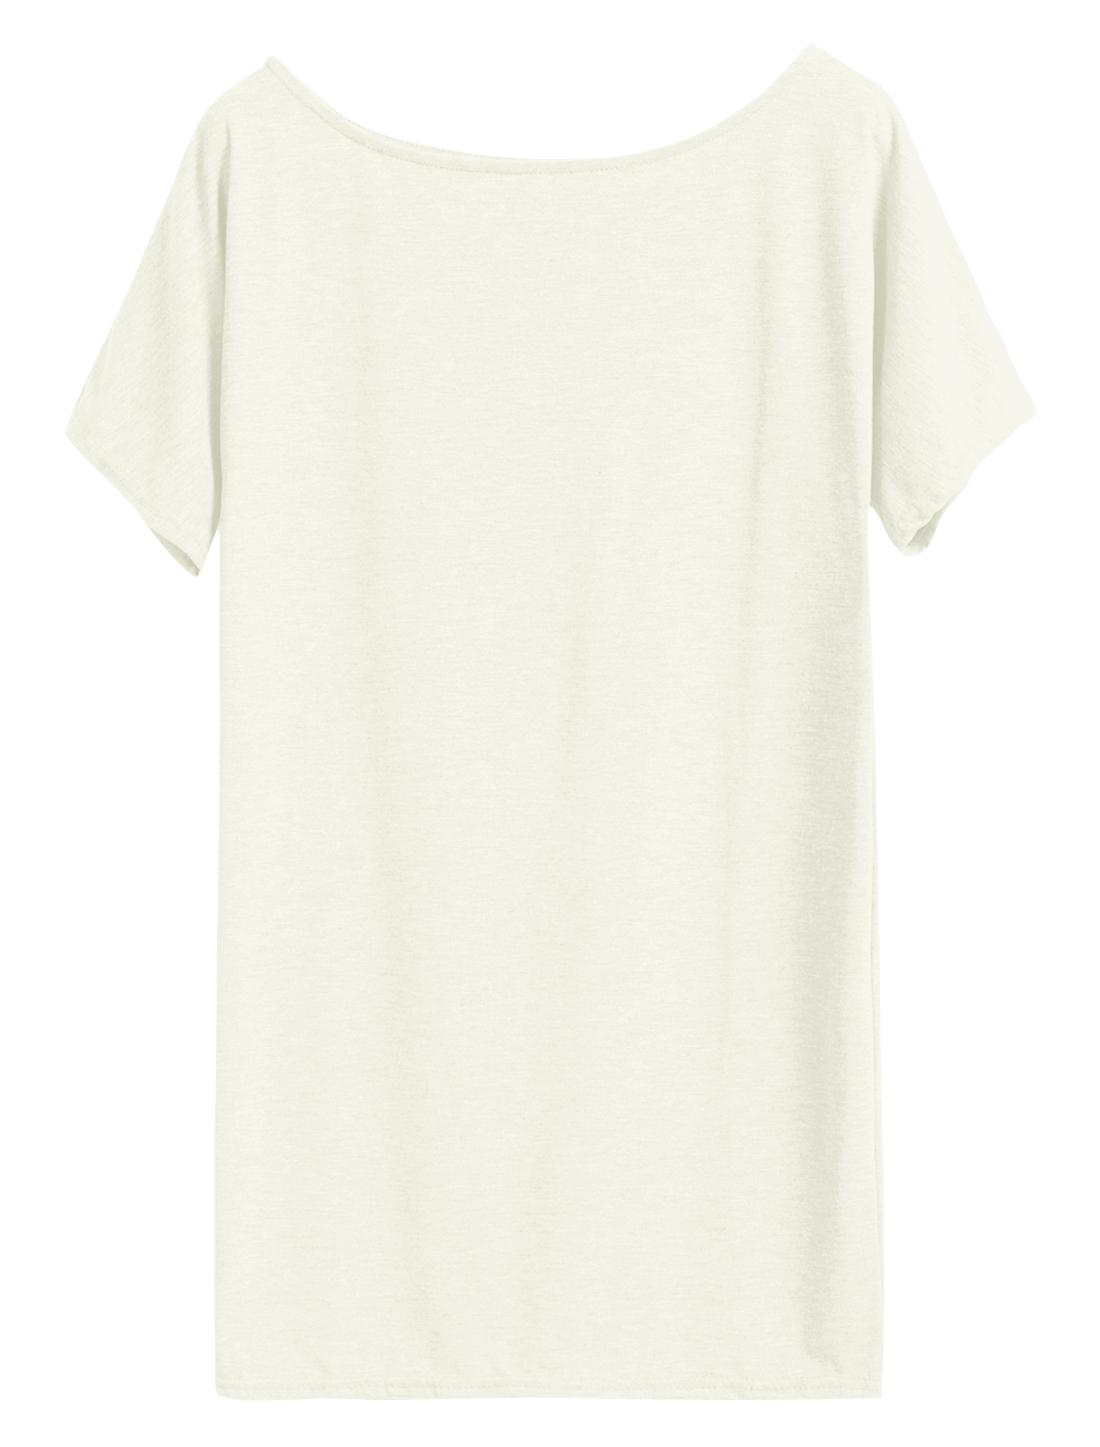 Ladies Short Batwing Sleeve Scoop Neck Loose Tunic Top White M